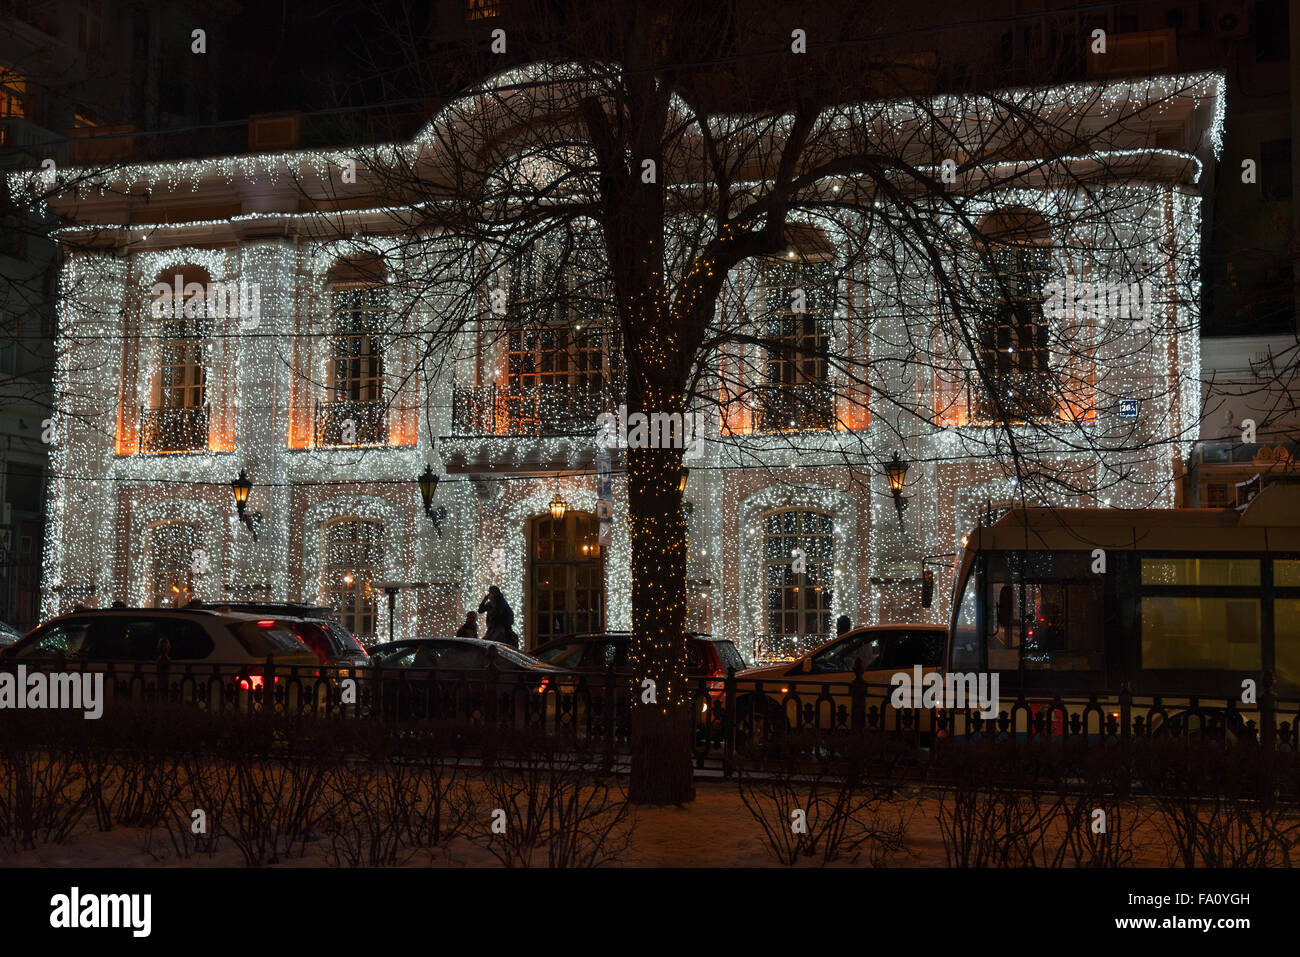 the house decorated with Christmas illumination - Stock Image